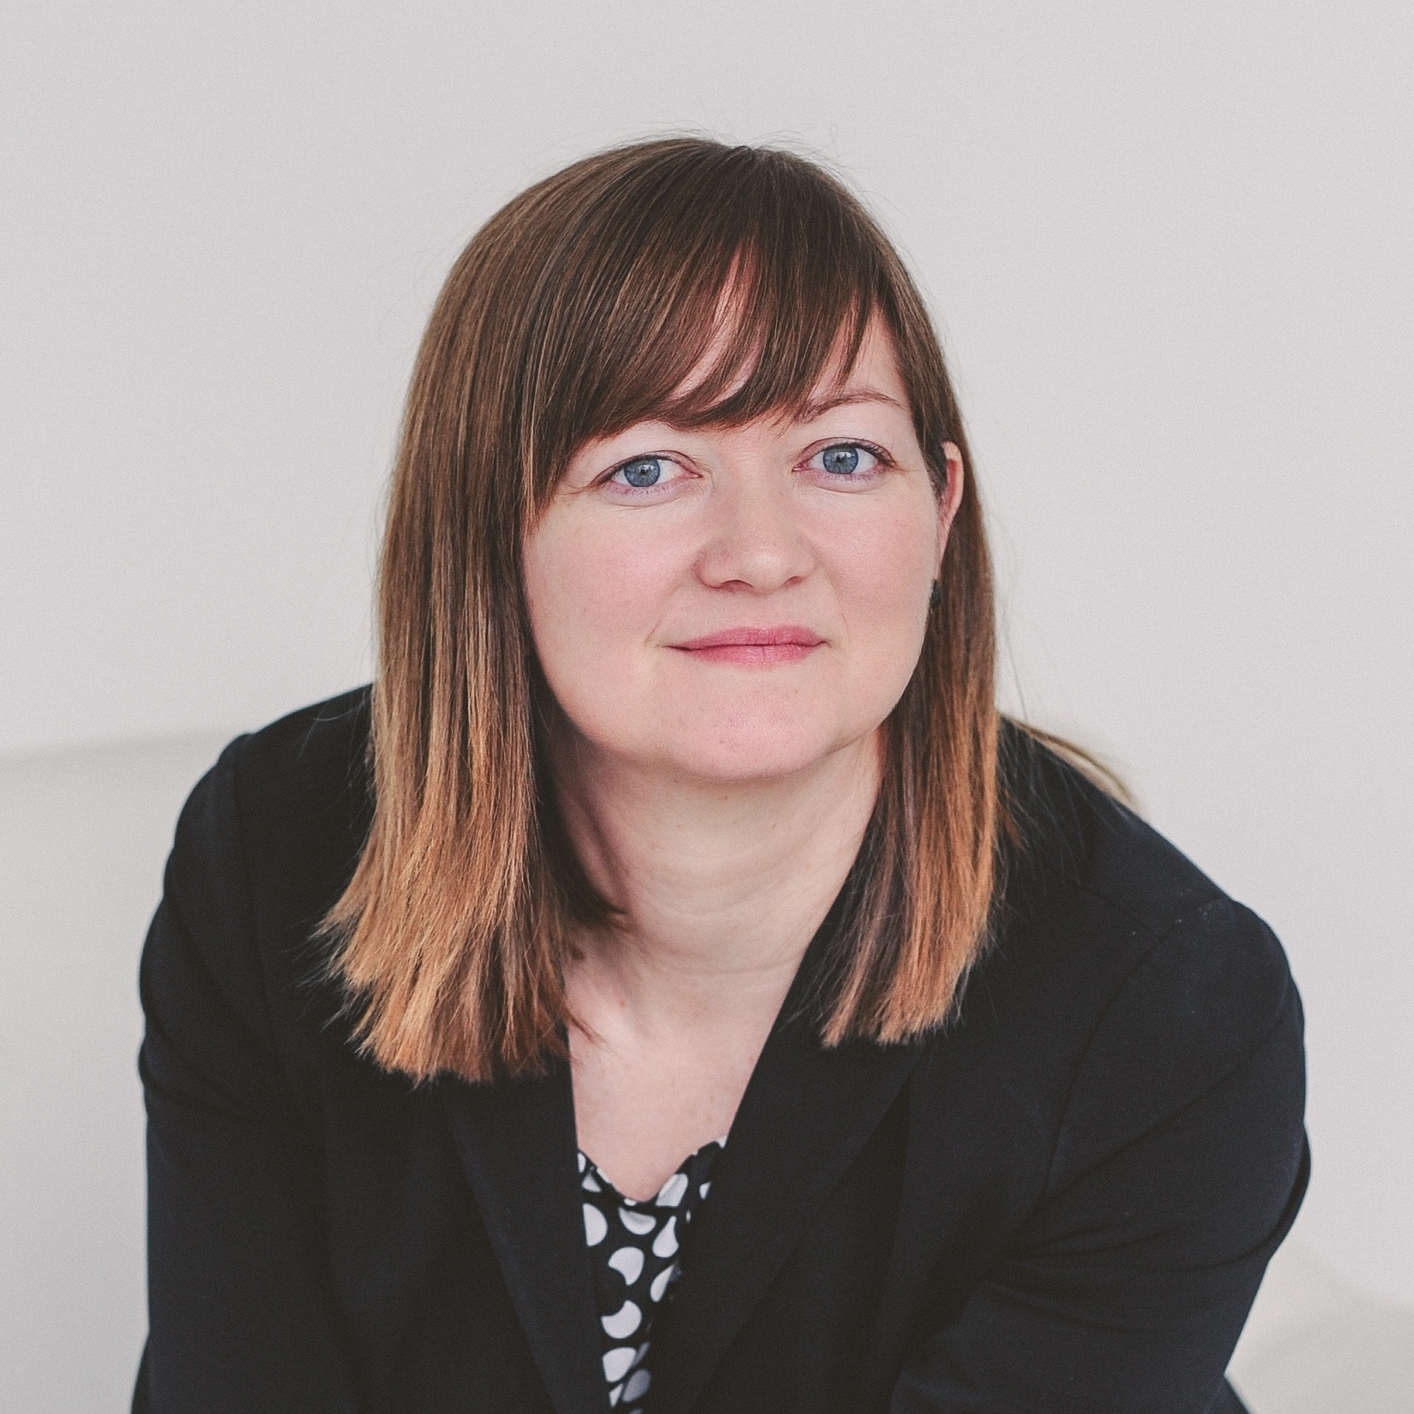 Denise Thompson